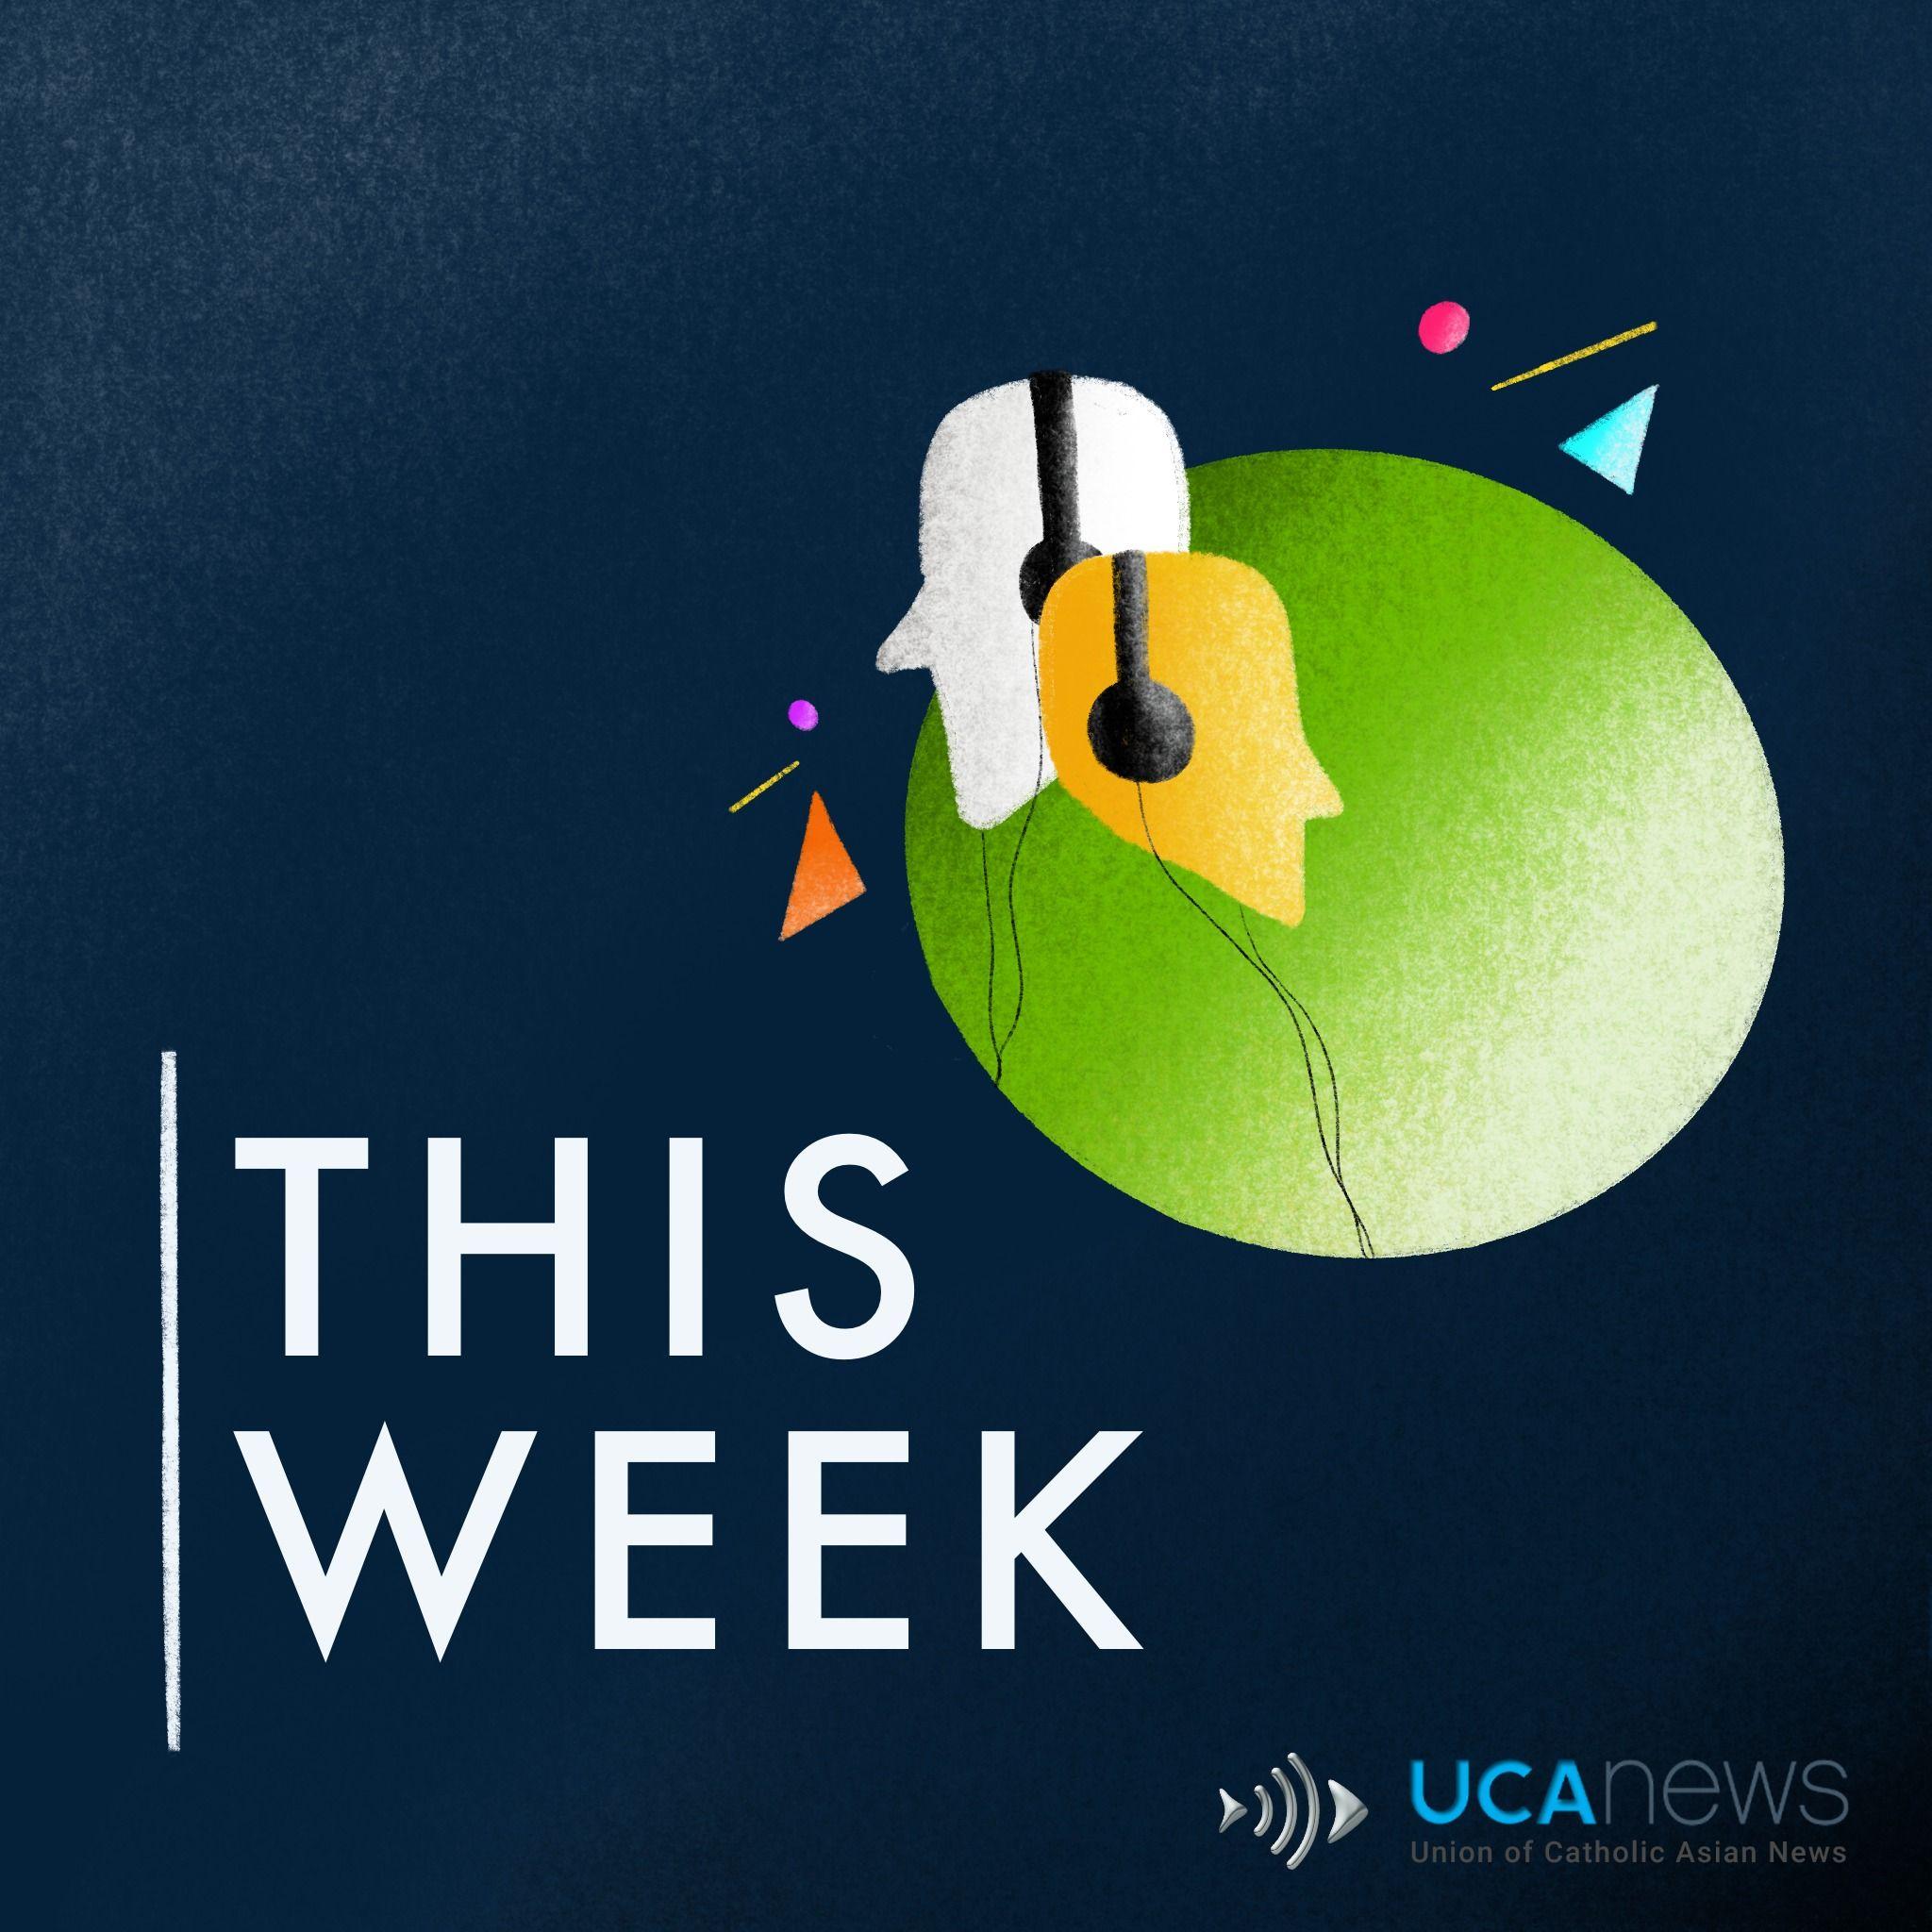 UCA News Weekly Summary, September 10, 2021